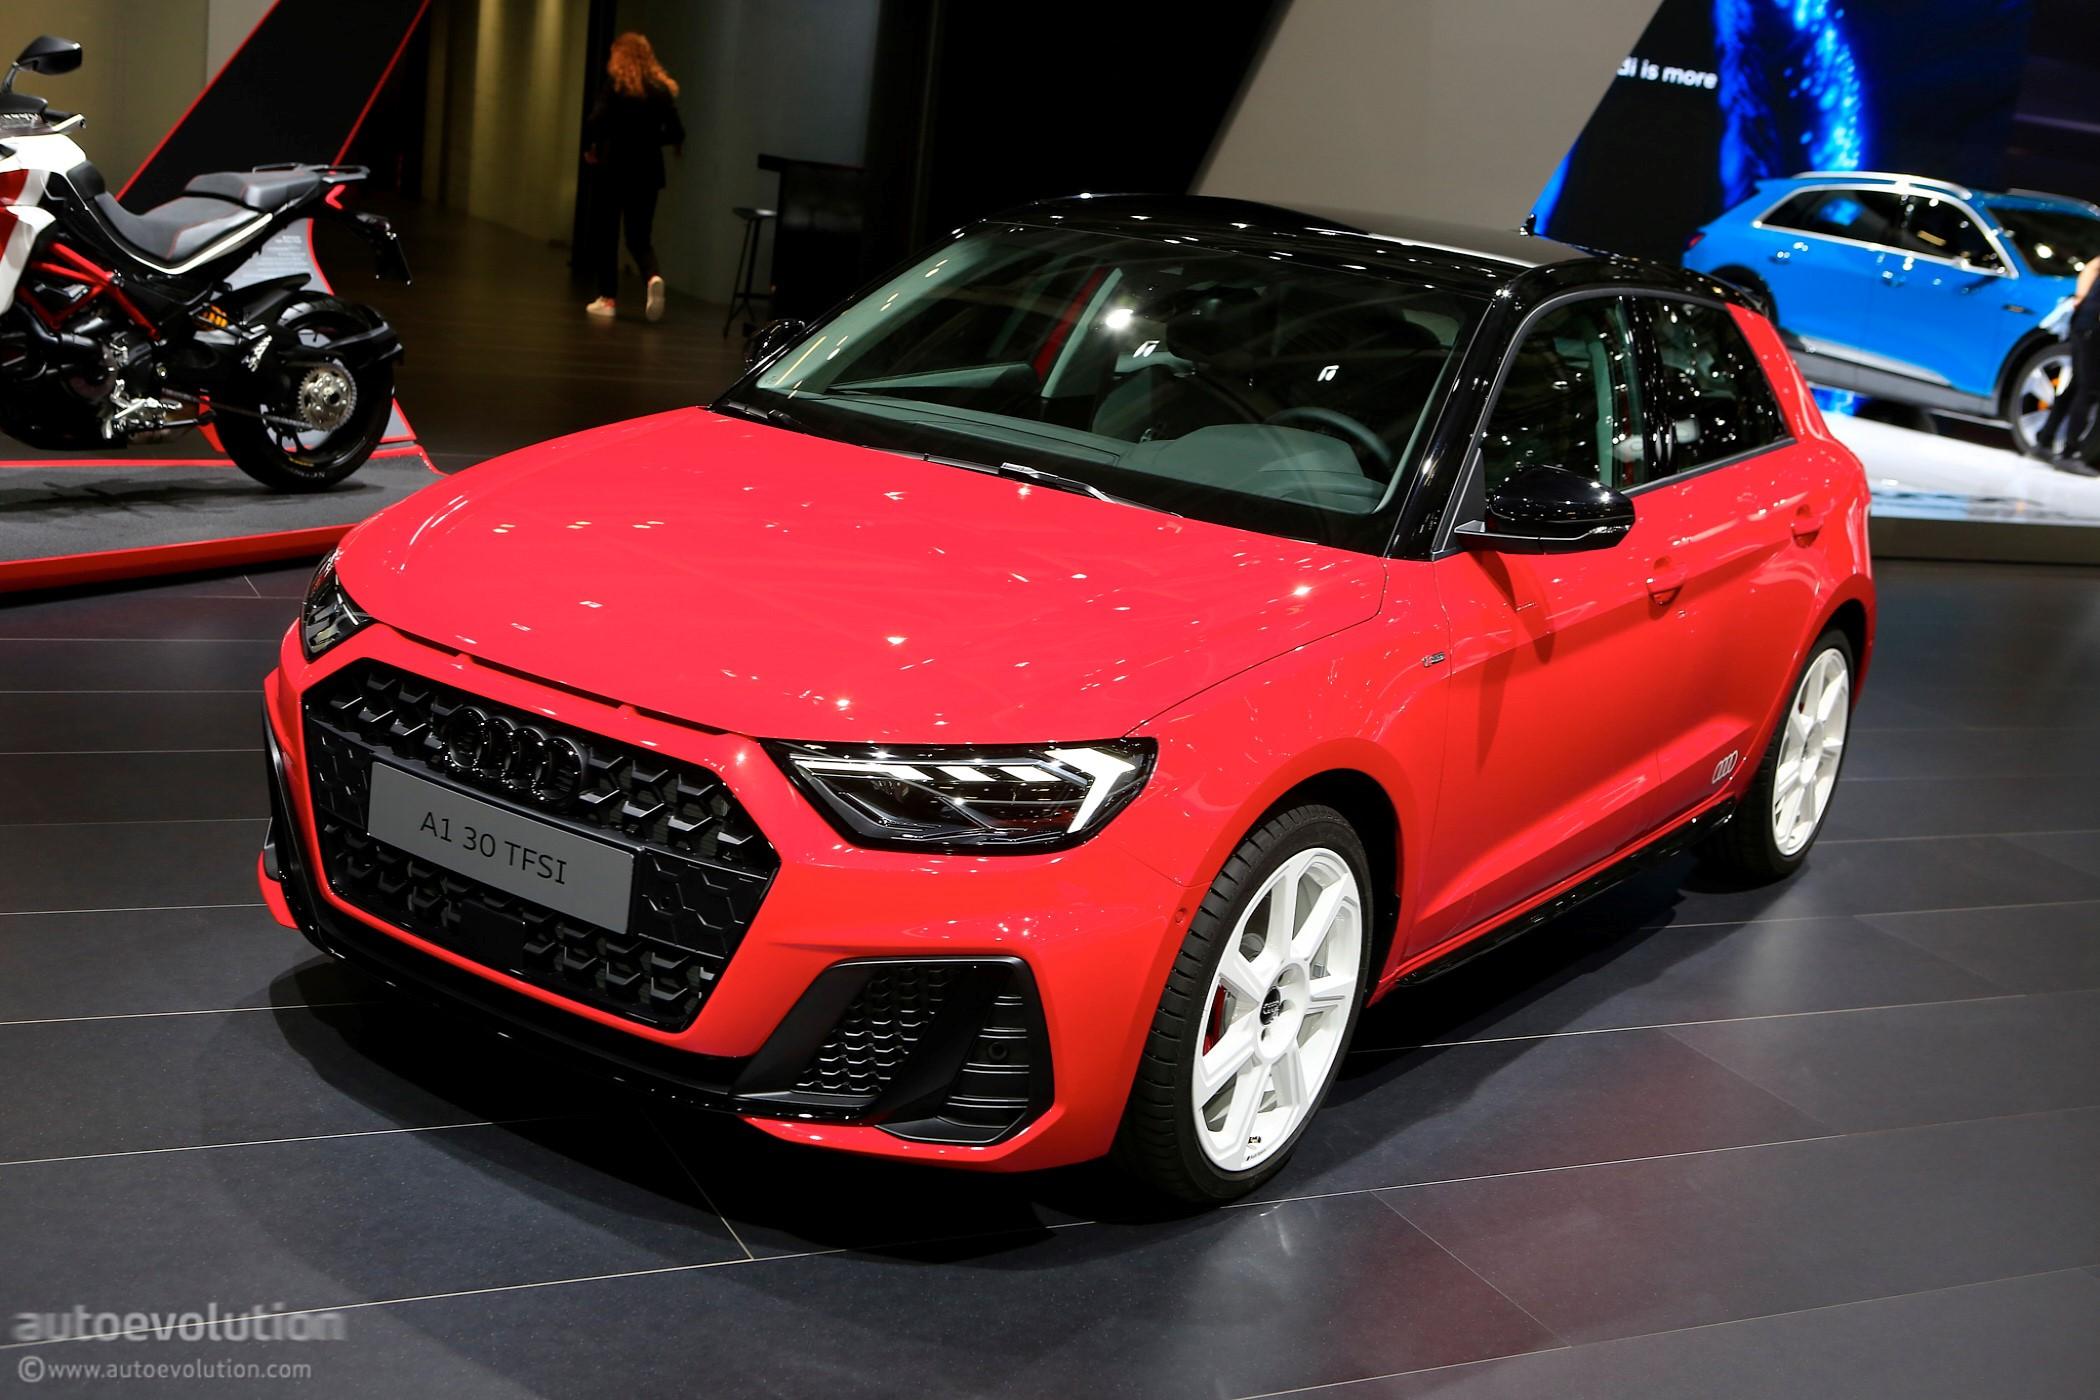 2018 paris motor show new audi a1 sportback looks very premium autoevolution. Black Bedroom Furniture Sets. Home Design Ideas